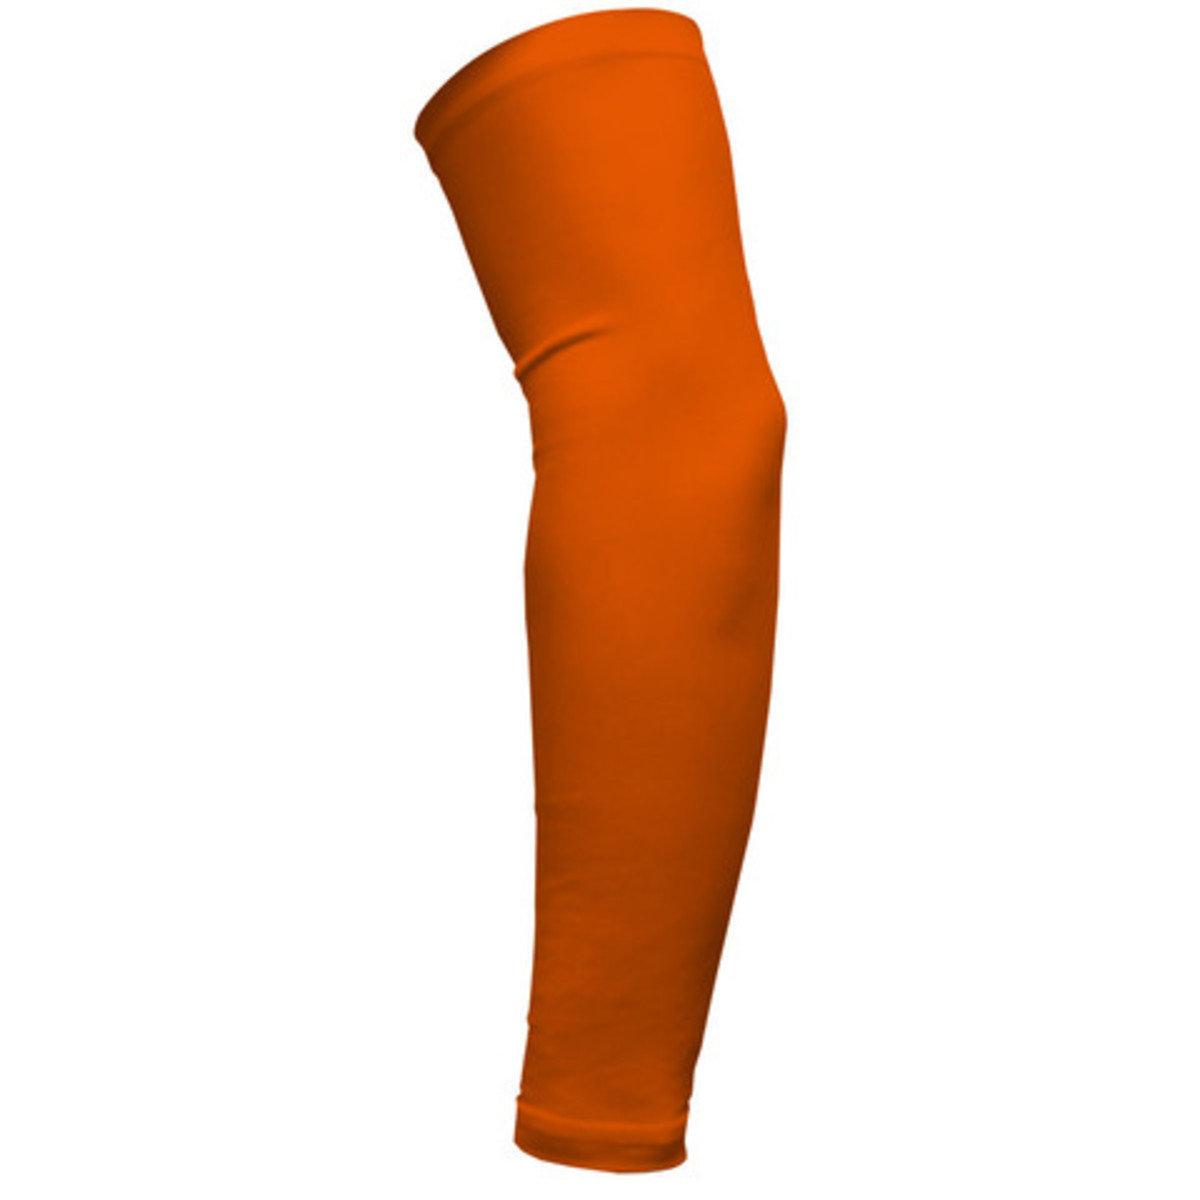 Mandarin Arm Sleeves-SL-MAN